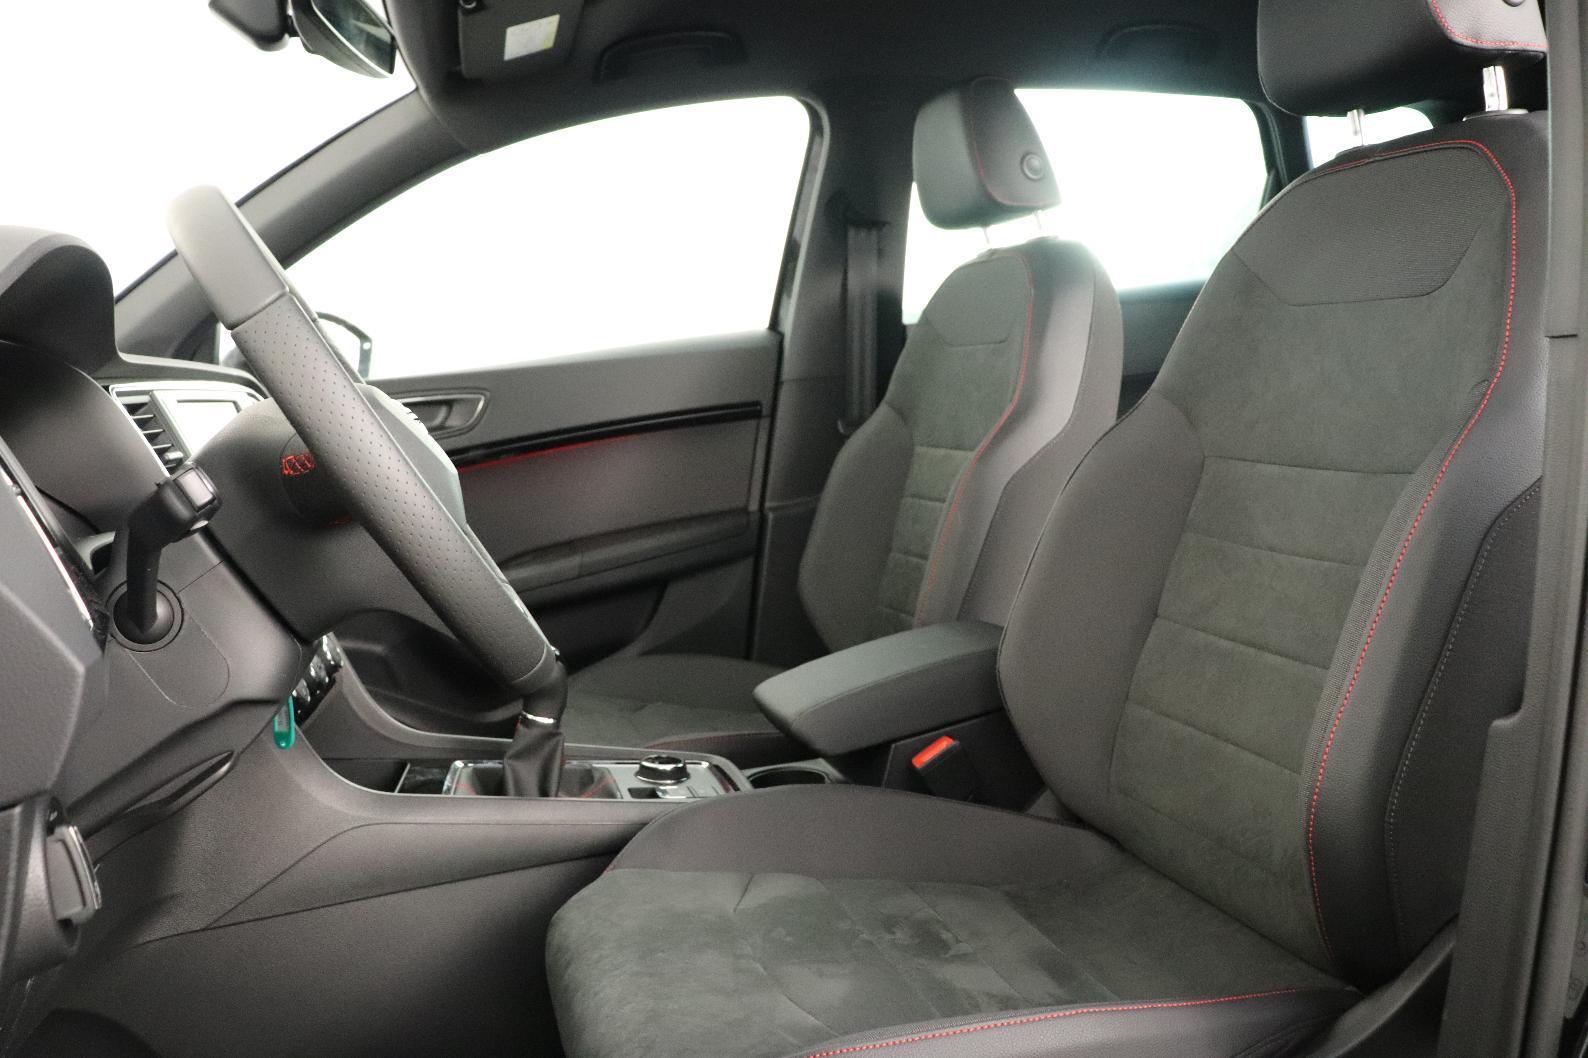 SEAT Ateca 1.5 TSI 150 ch ACT Start/Stop FR